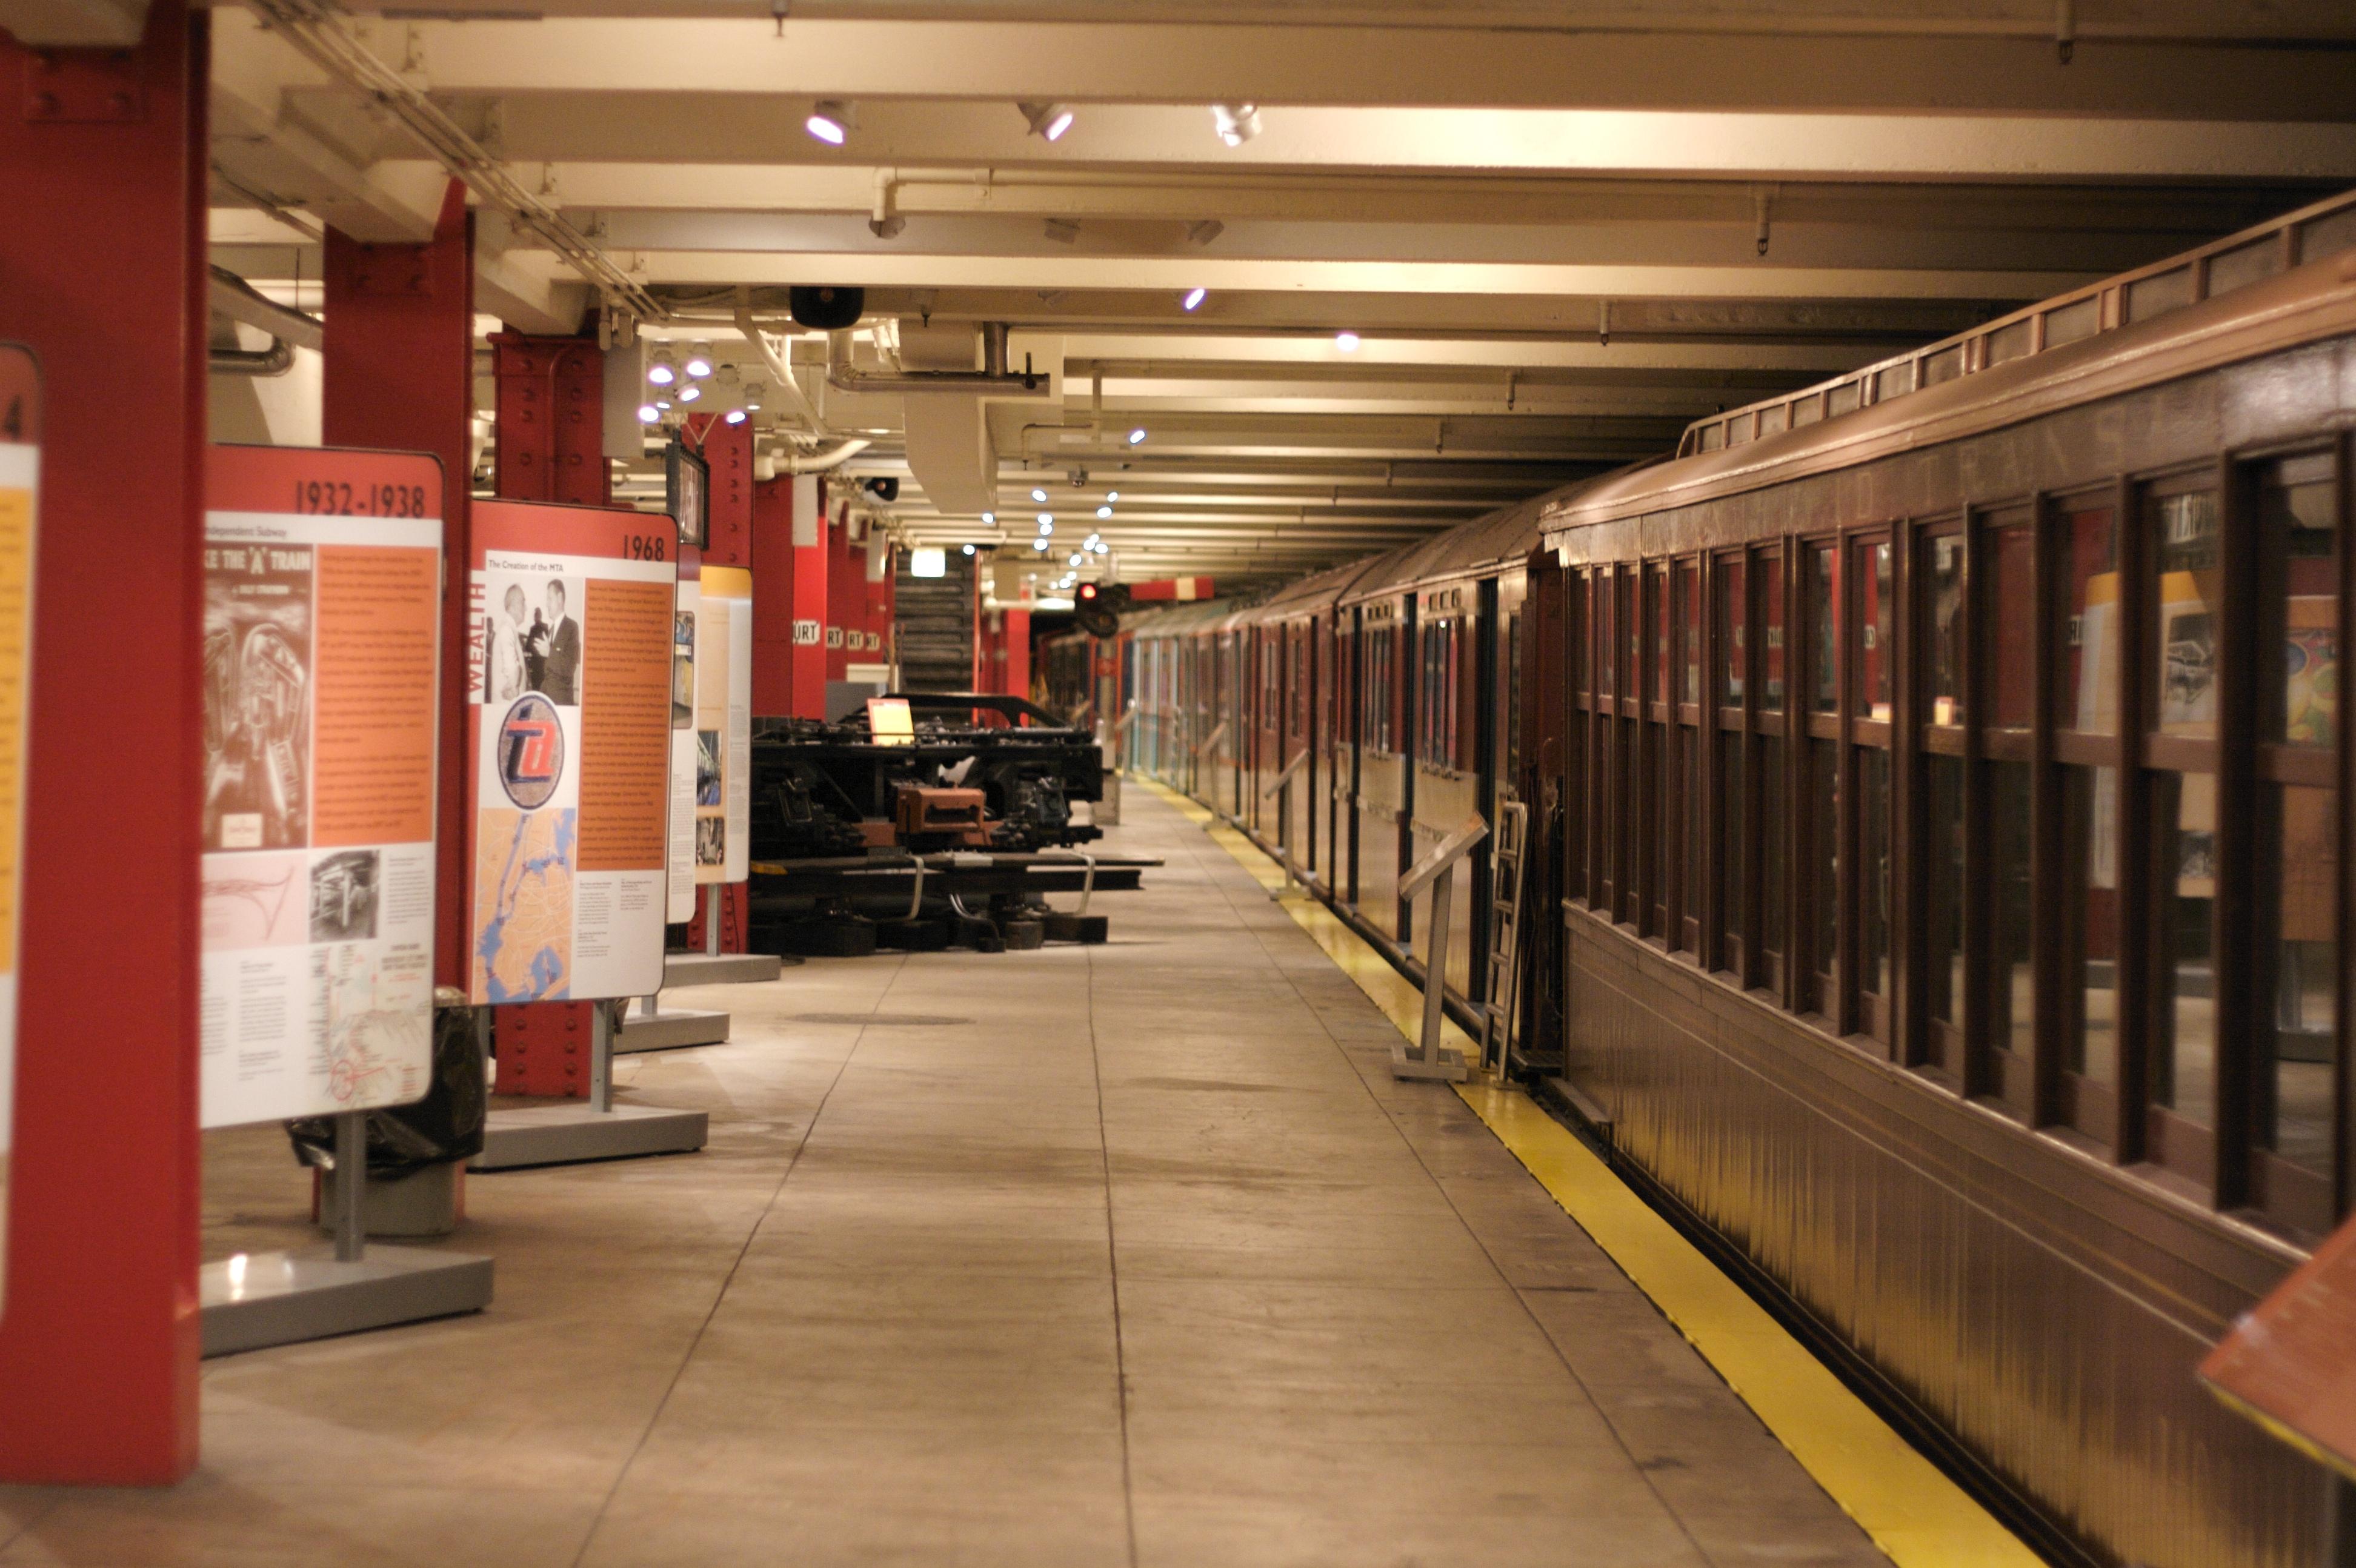 New york transit museum director